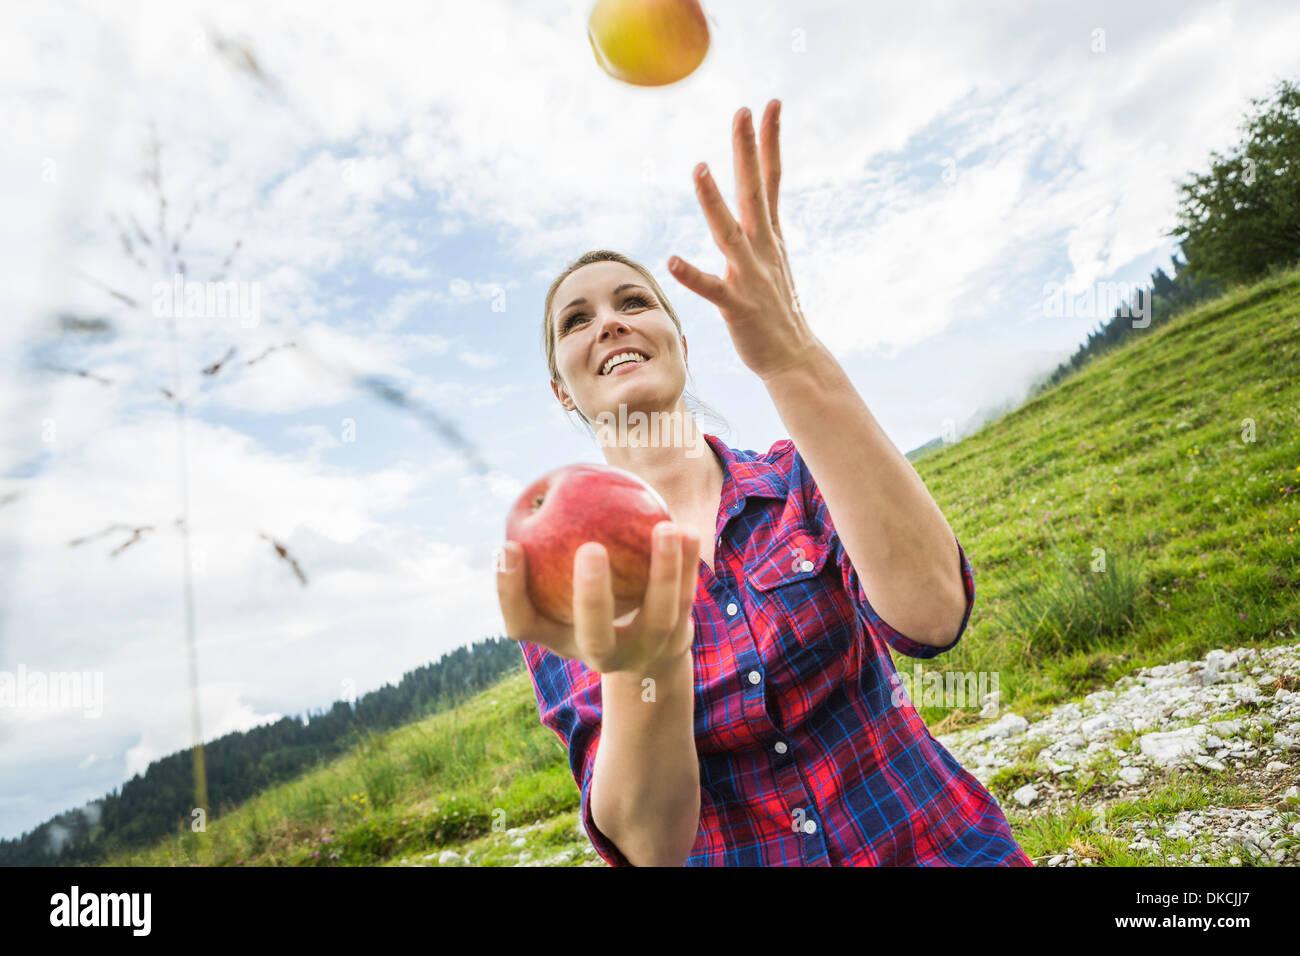 Woman juggling apples - Stock Image